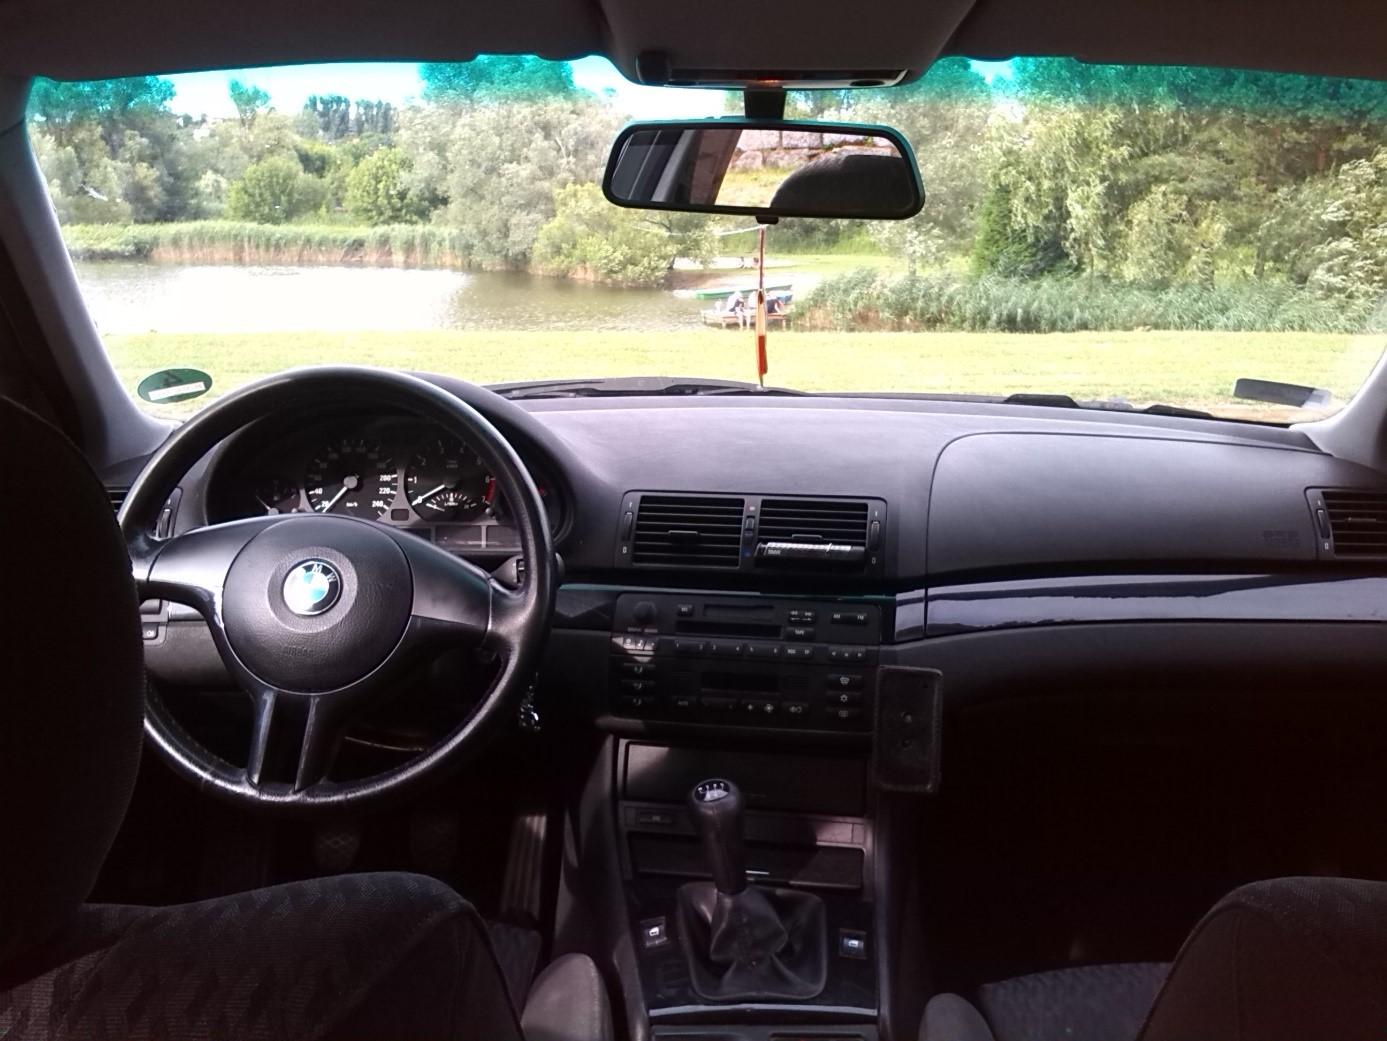 BMW e46325i teszt